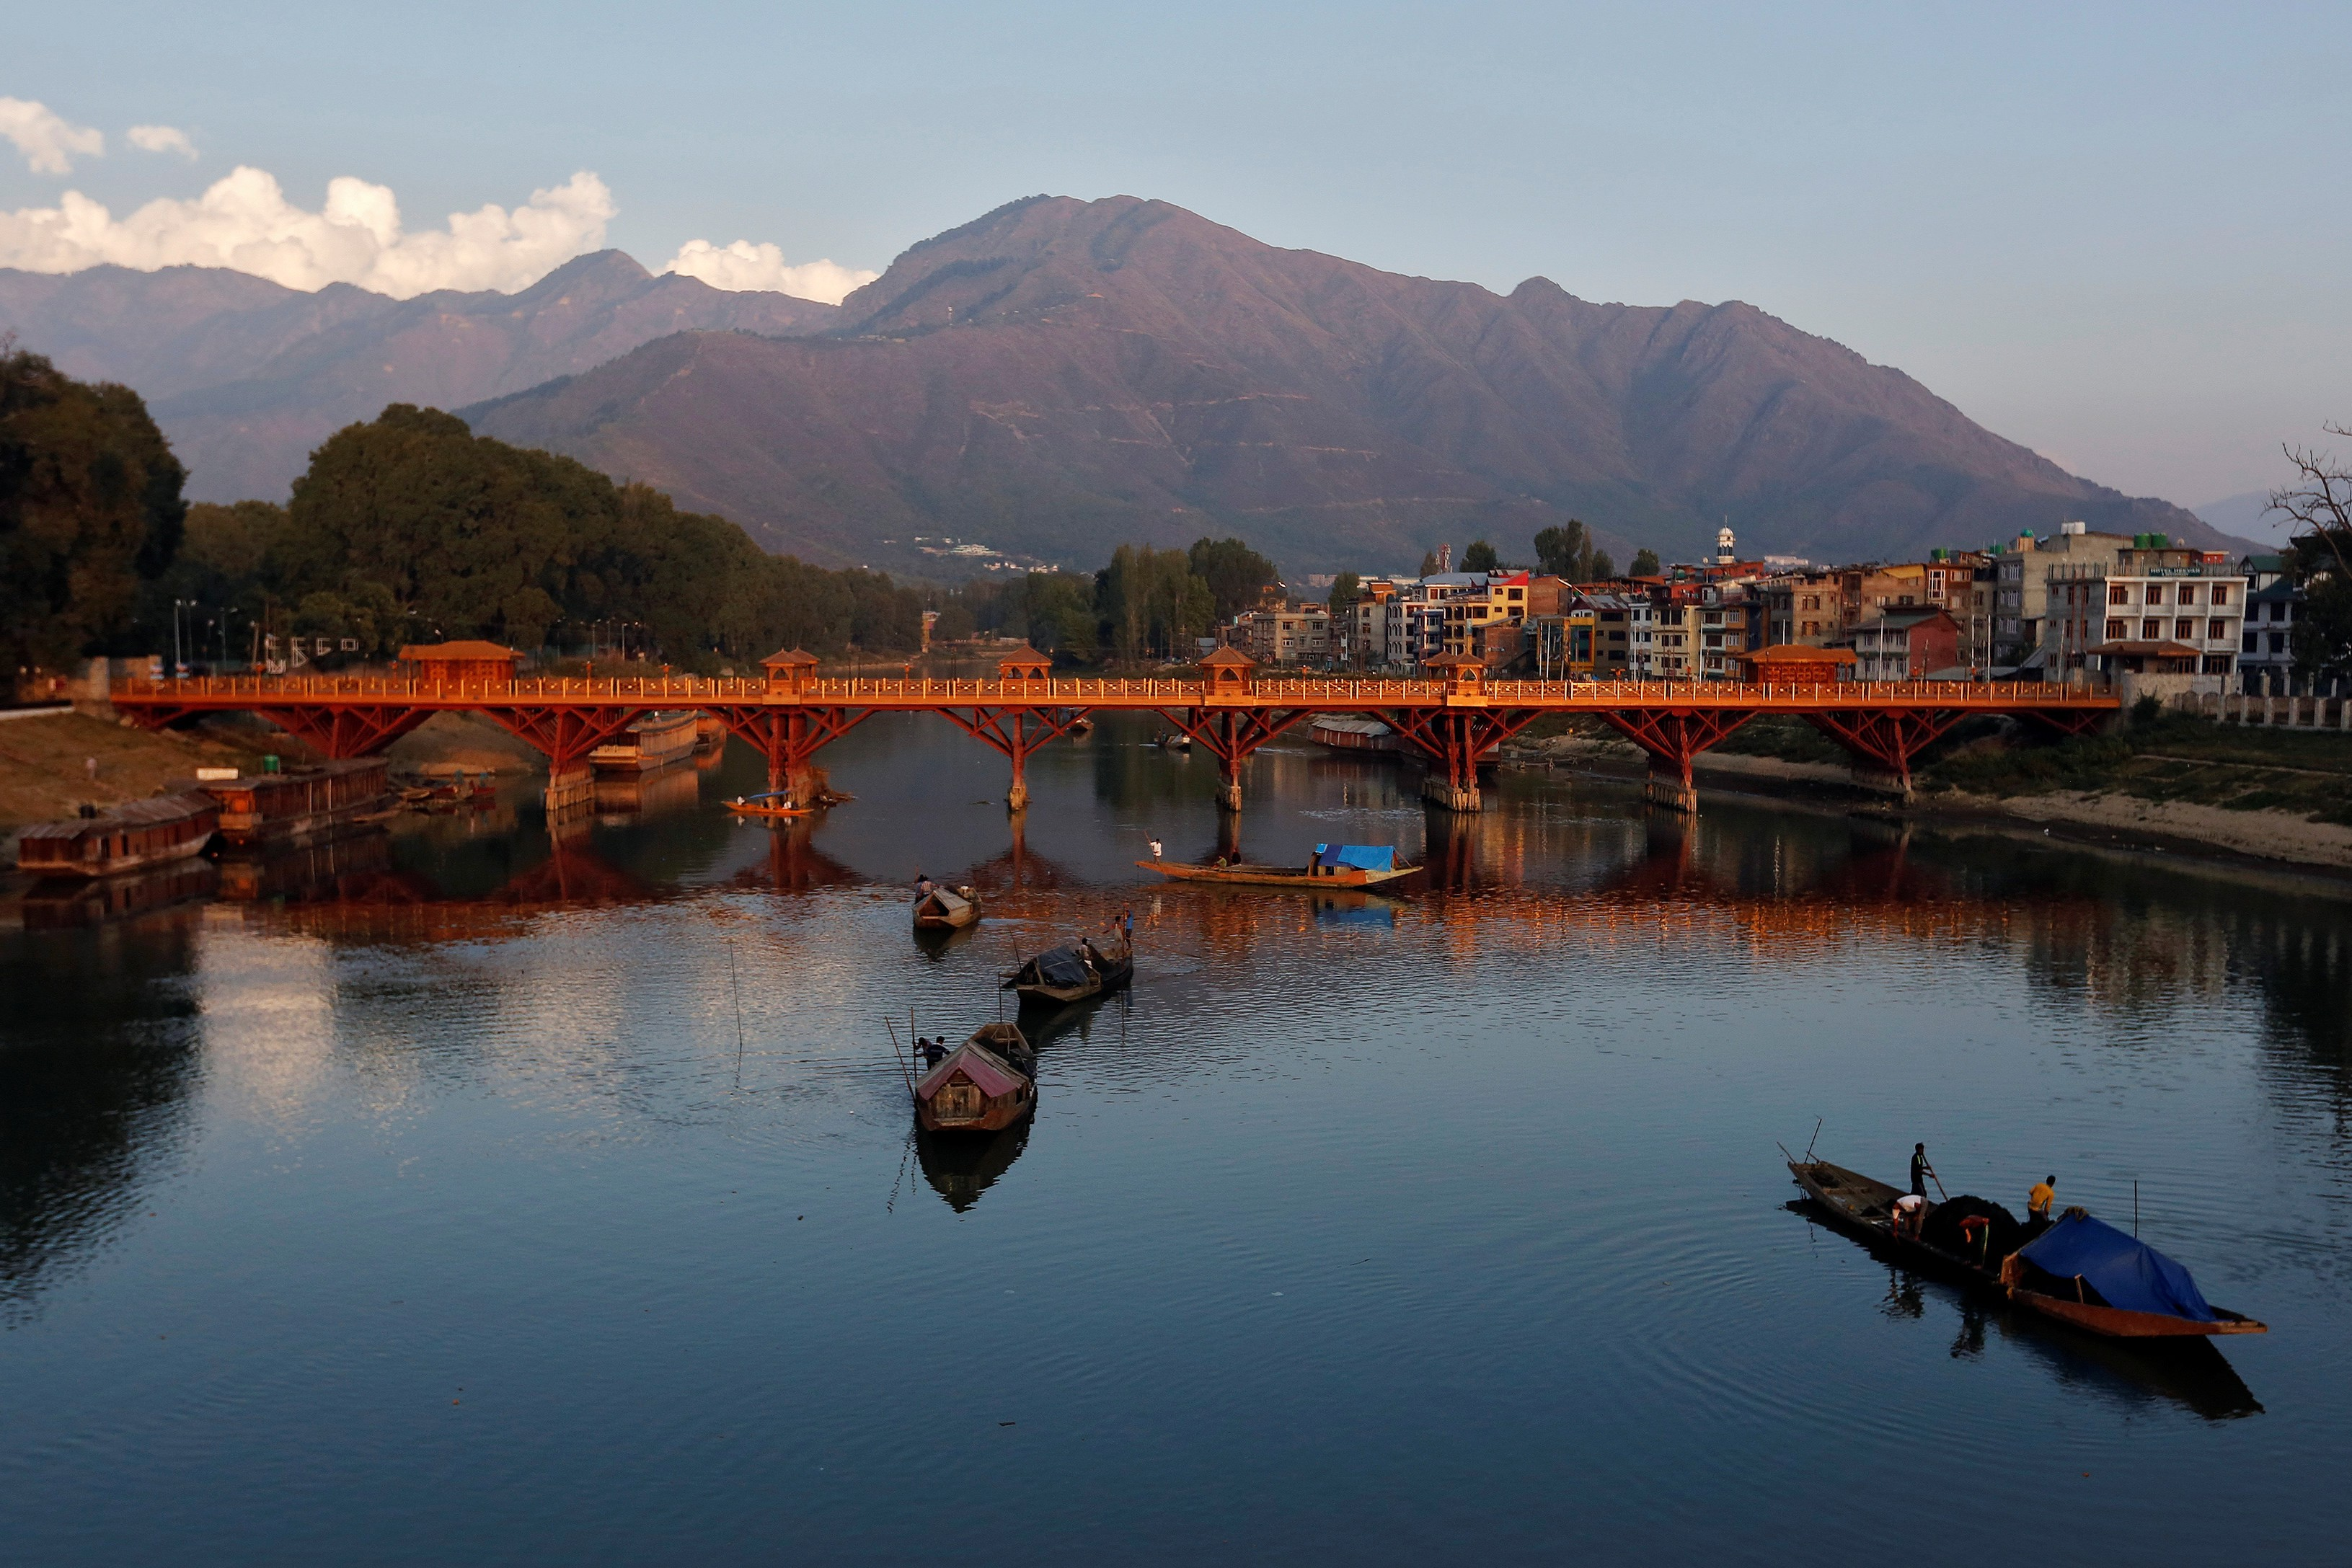 Uri Attack: India Has Presented Proofs Of Cross Border Origins To Pakistan